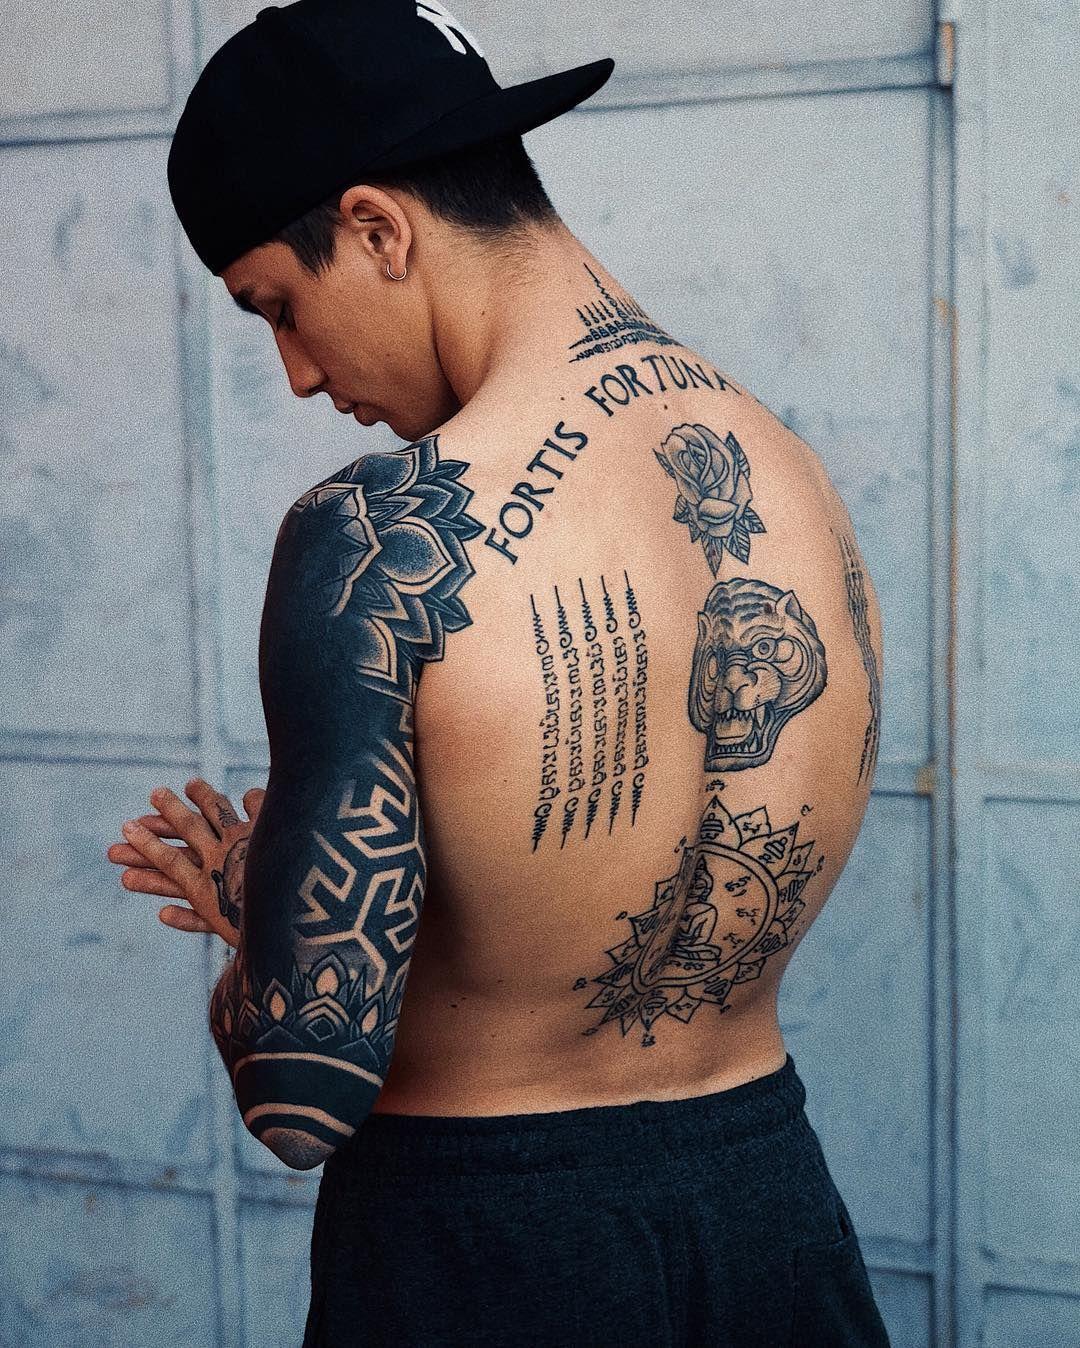 "Instagram'da Tattoo Inspiration Page: ""Tattoo GOALS on @christian_prosperini 😍💉 Follow @christian_prosperini @christian_prosperini @christian_prosperini for more tattoo pics ❤️"""